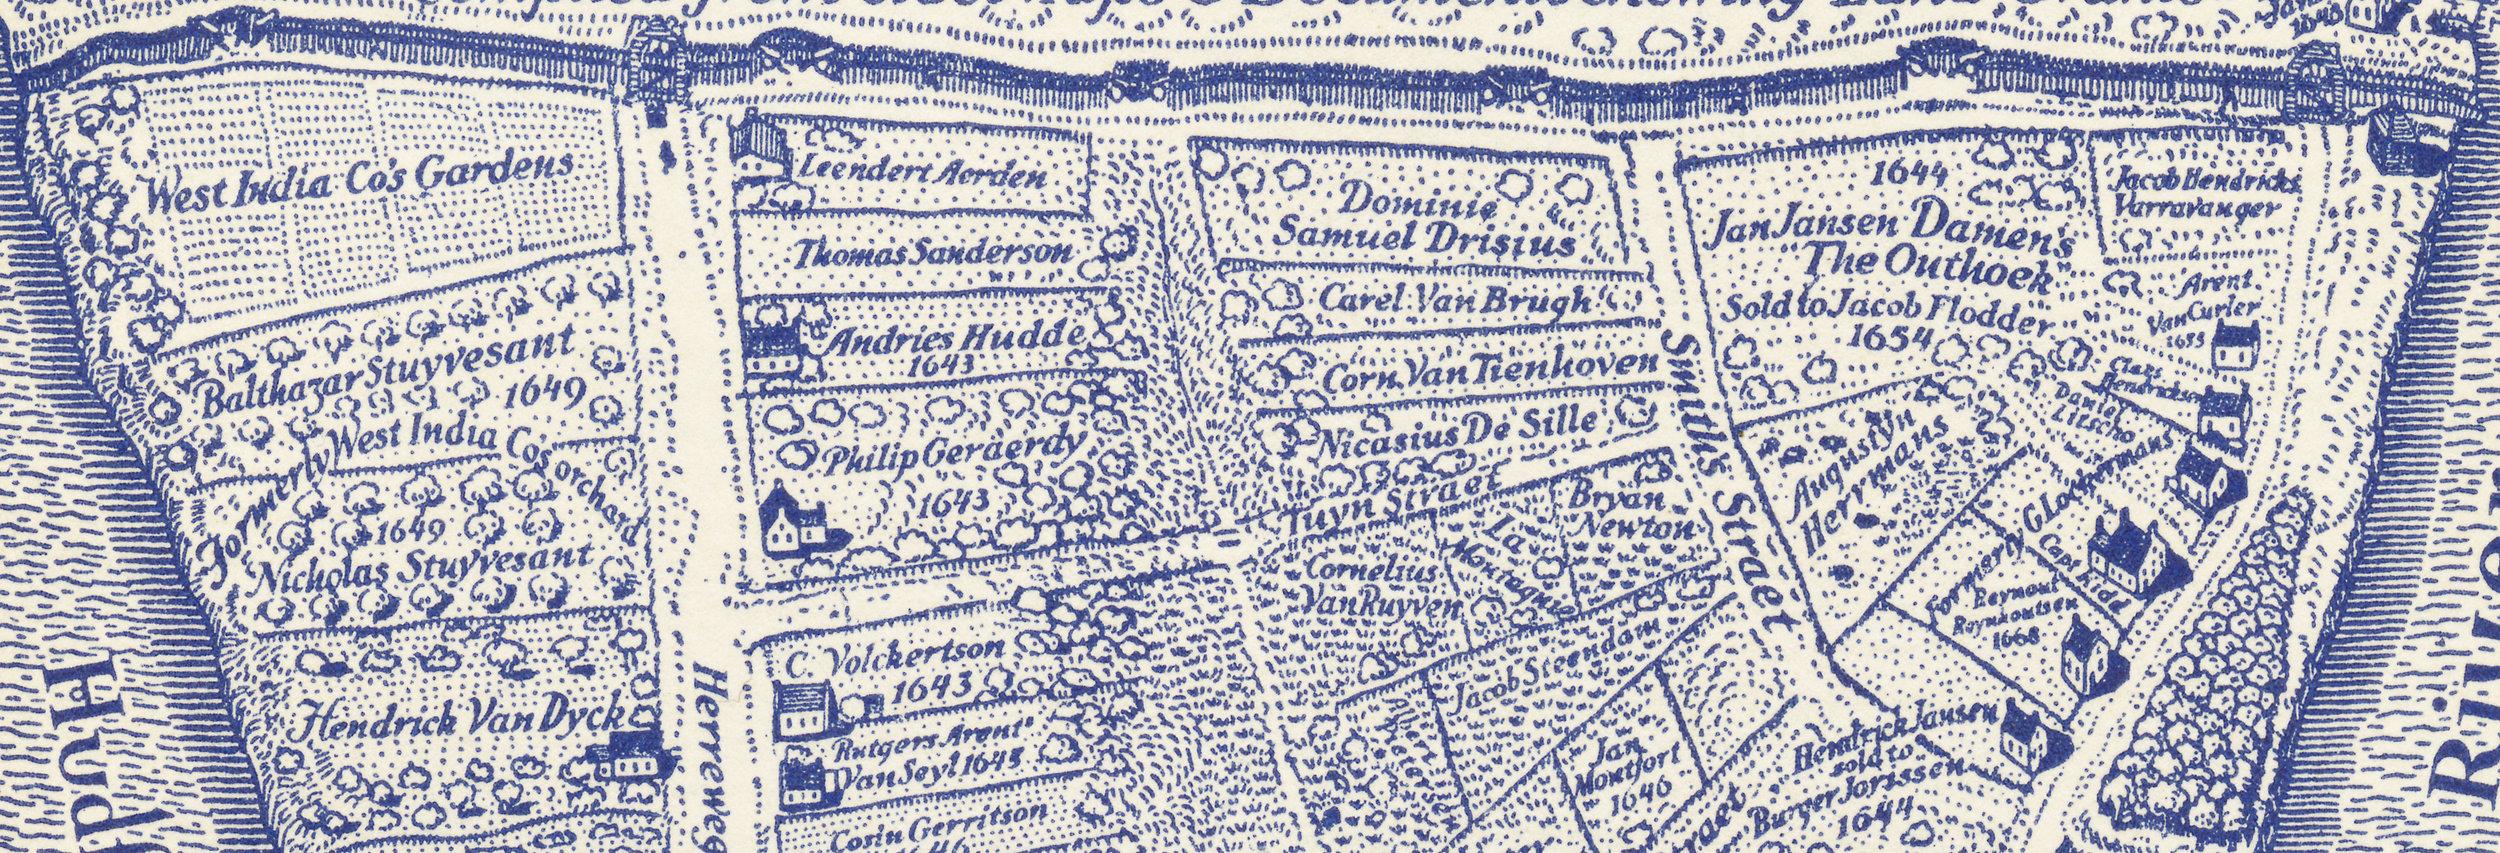 map of new amsterdam.JPG